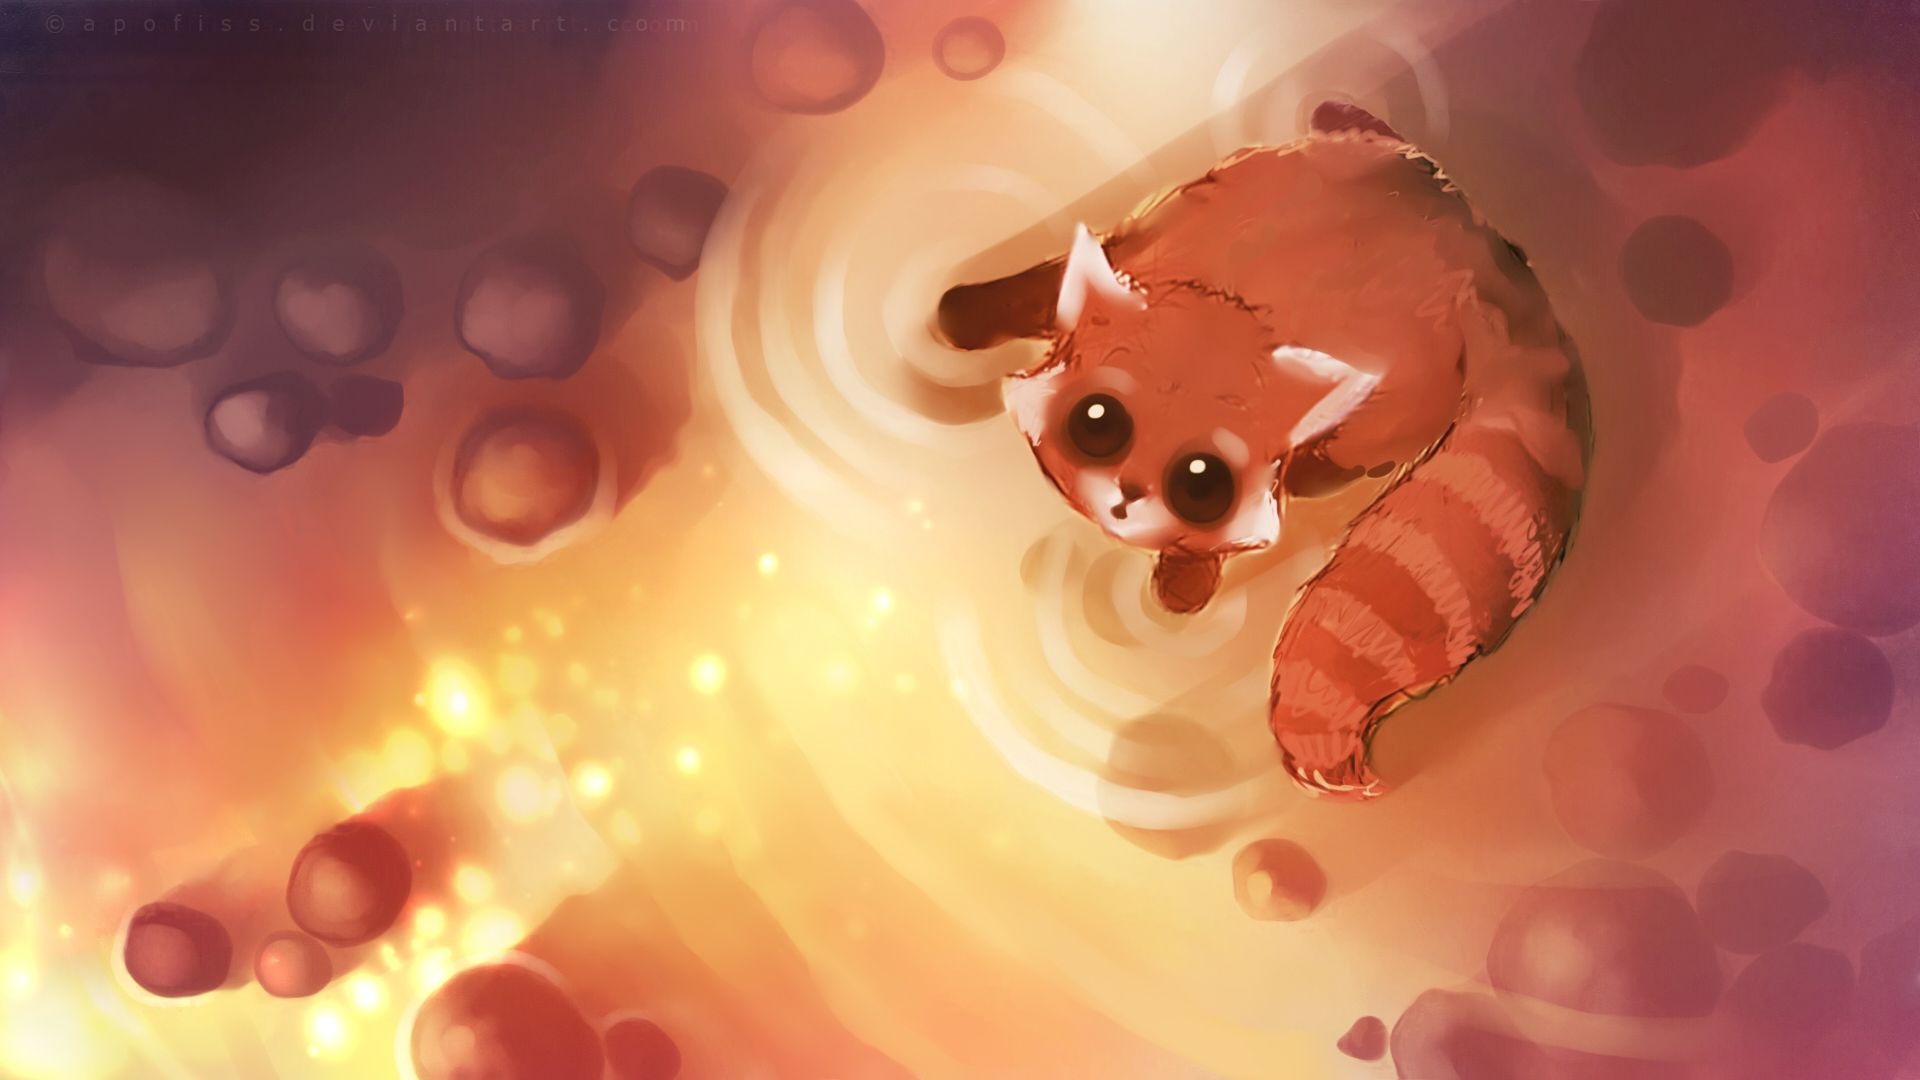 Download Cute Fox Cartoon Wallpaper 1920x1080 Hd Wallpapers